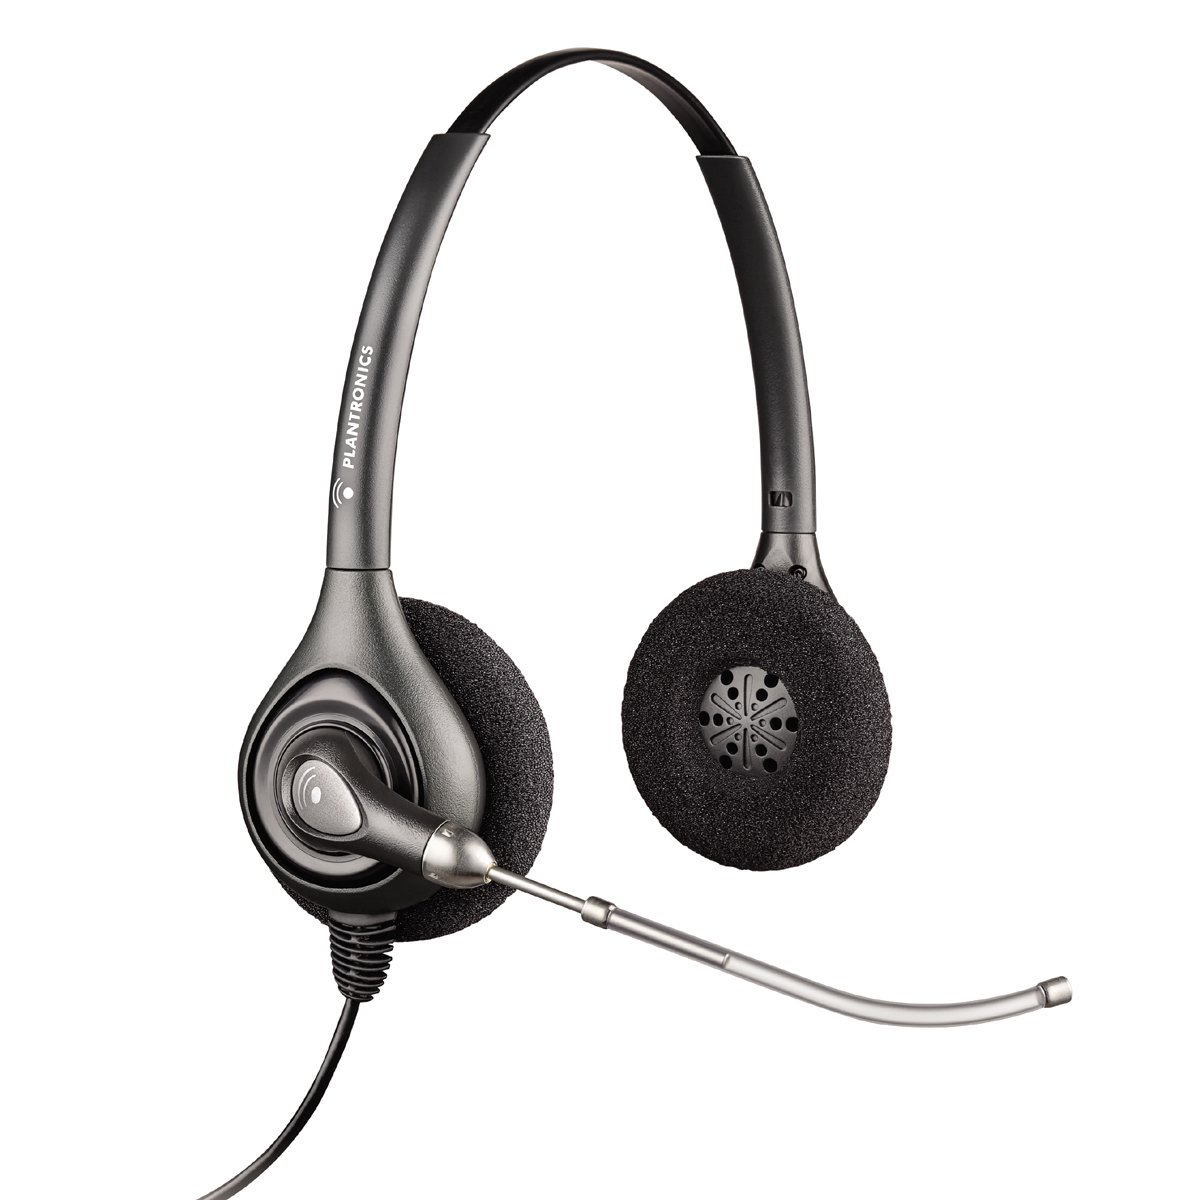 Plantronics HW251 SupraPlus Monaural Over-The-Head Wideband Professional Headset